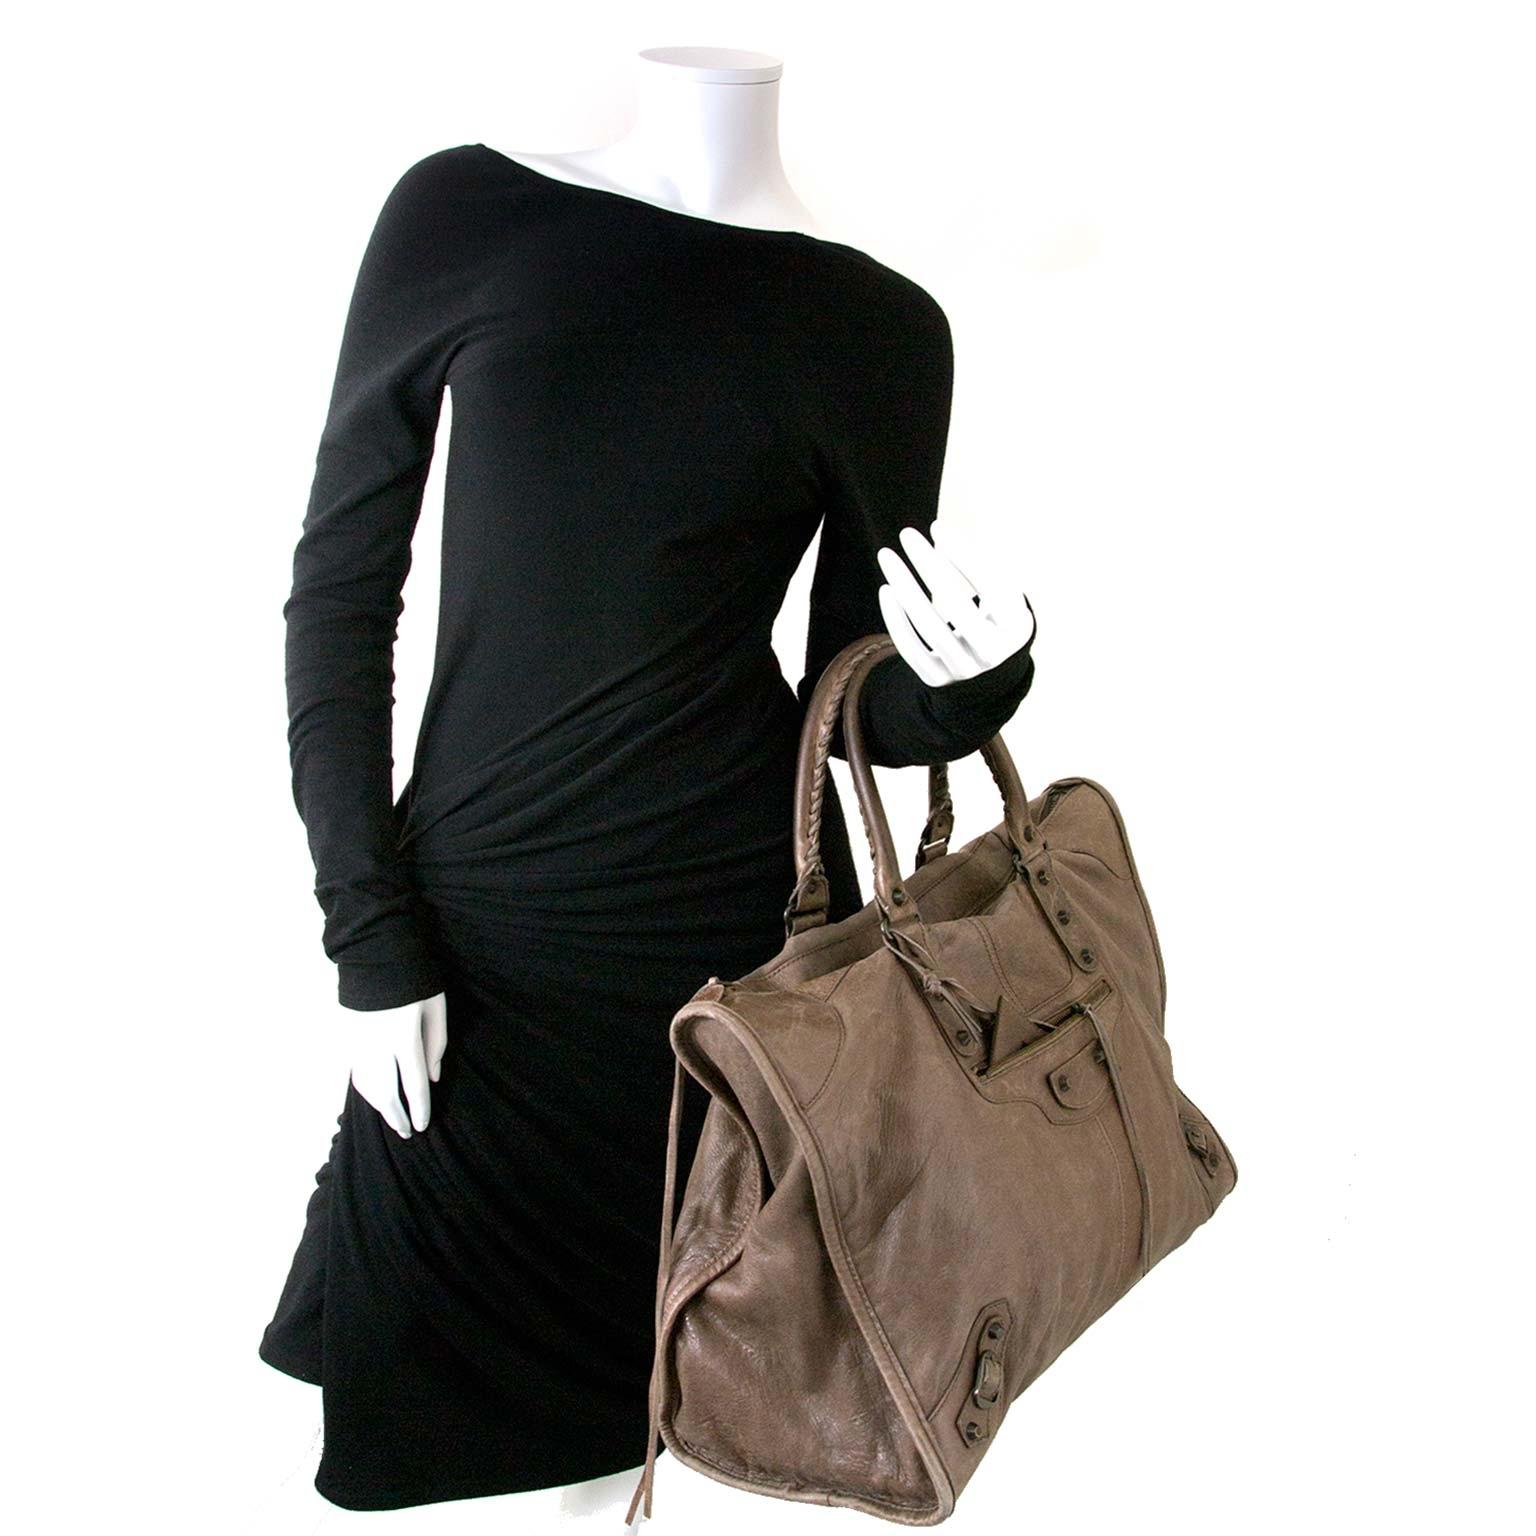 Balenciaga Weekender Seigle Agneau Leather Bag for sale online at Labellov